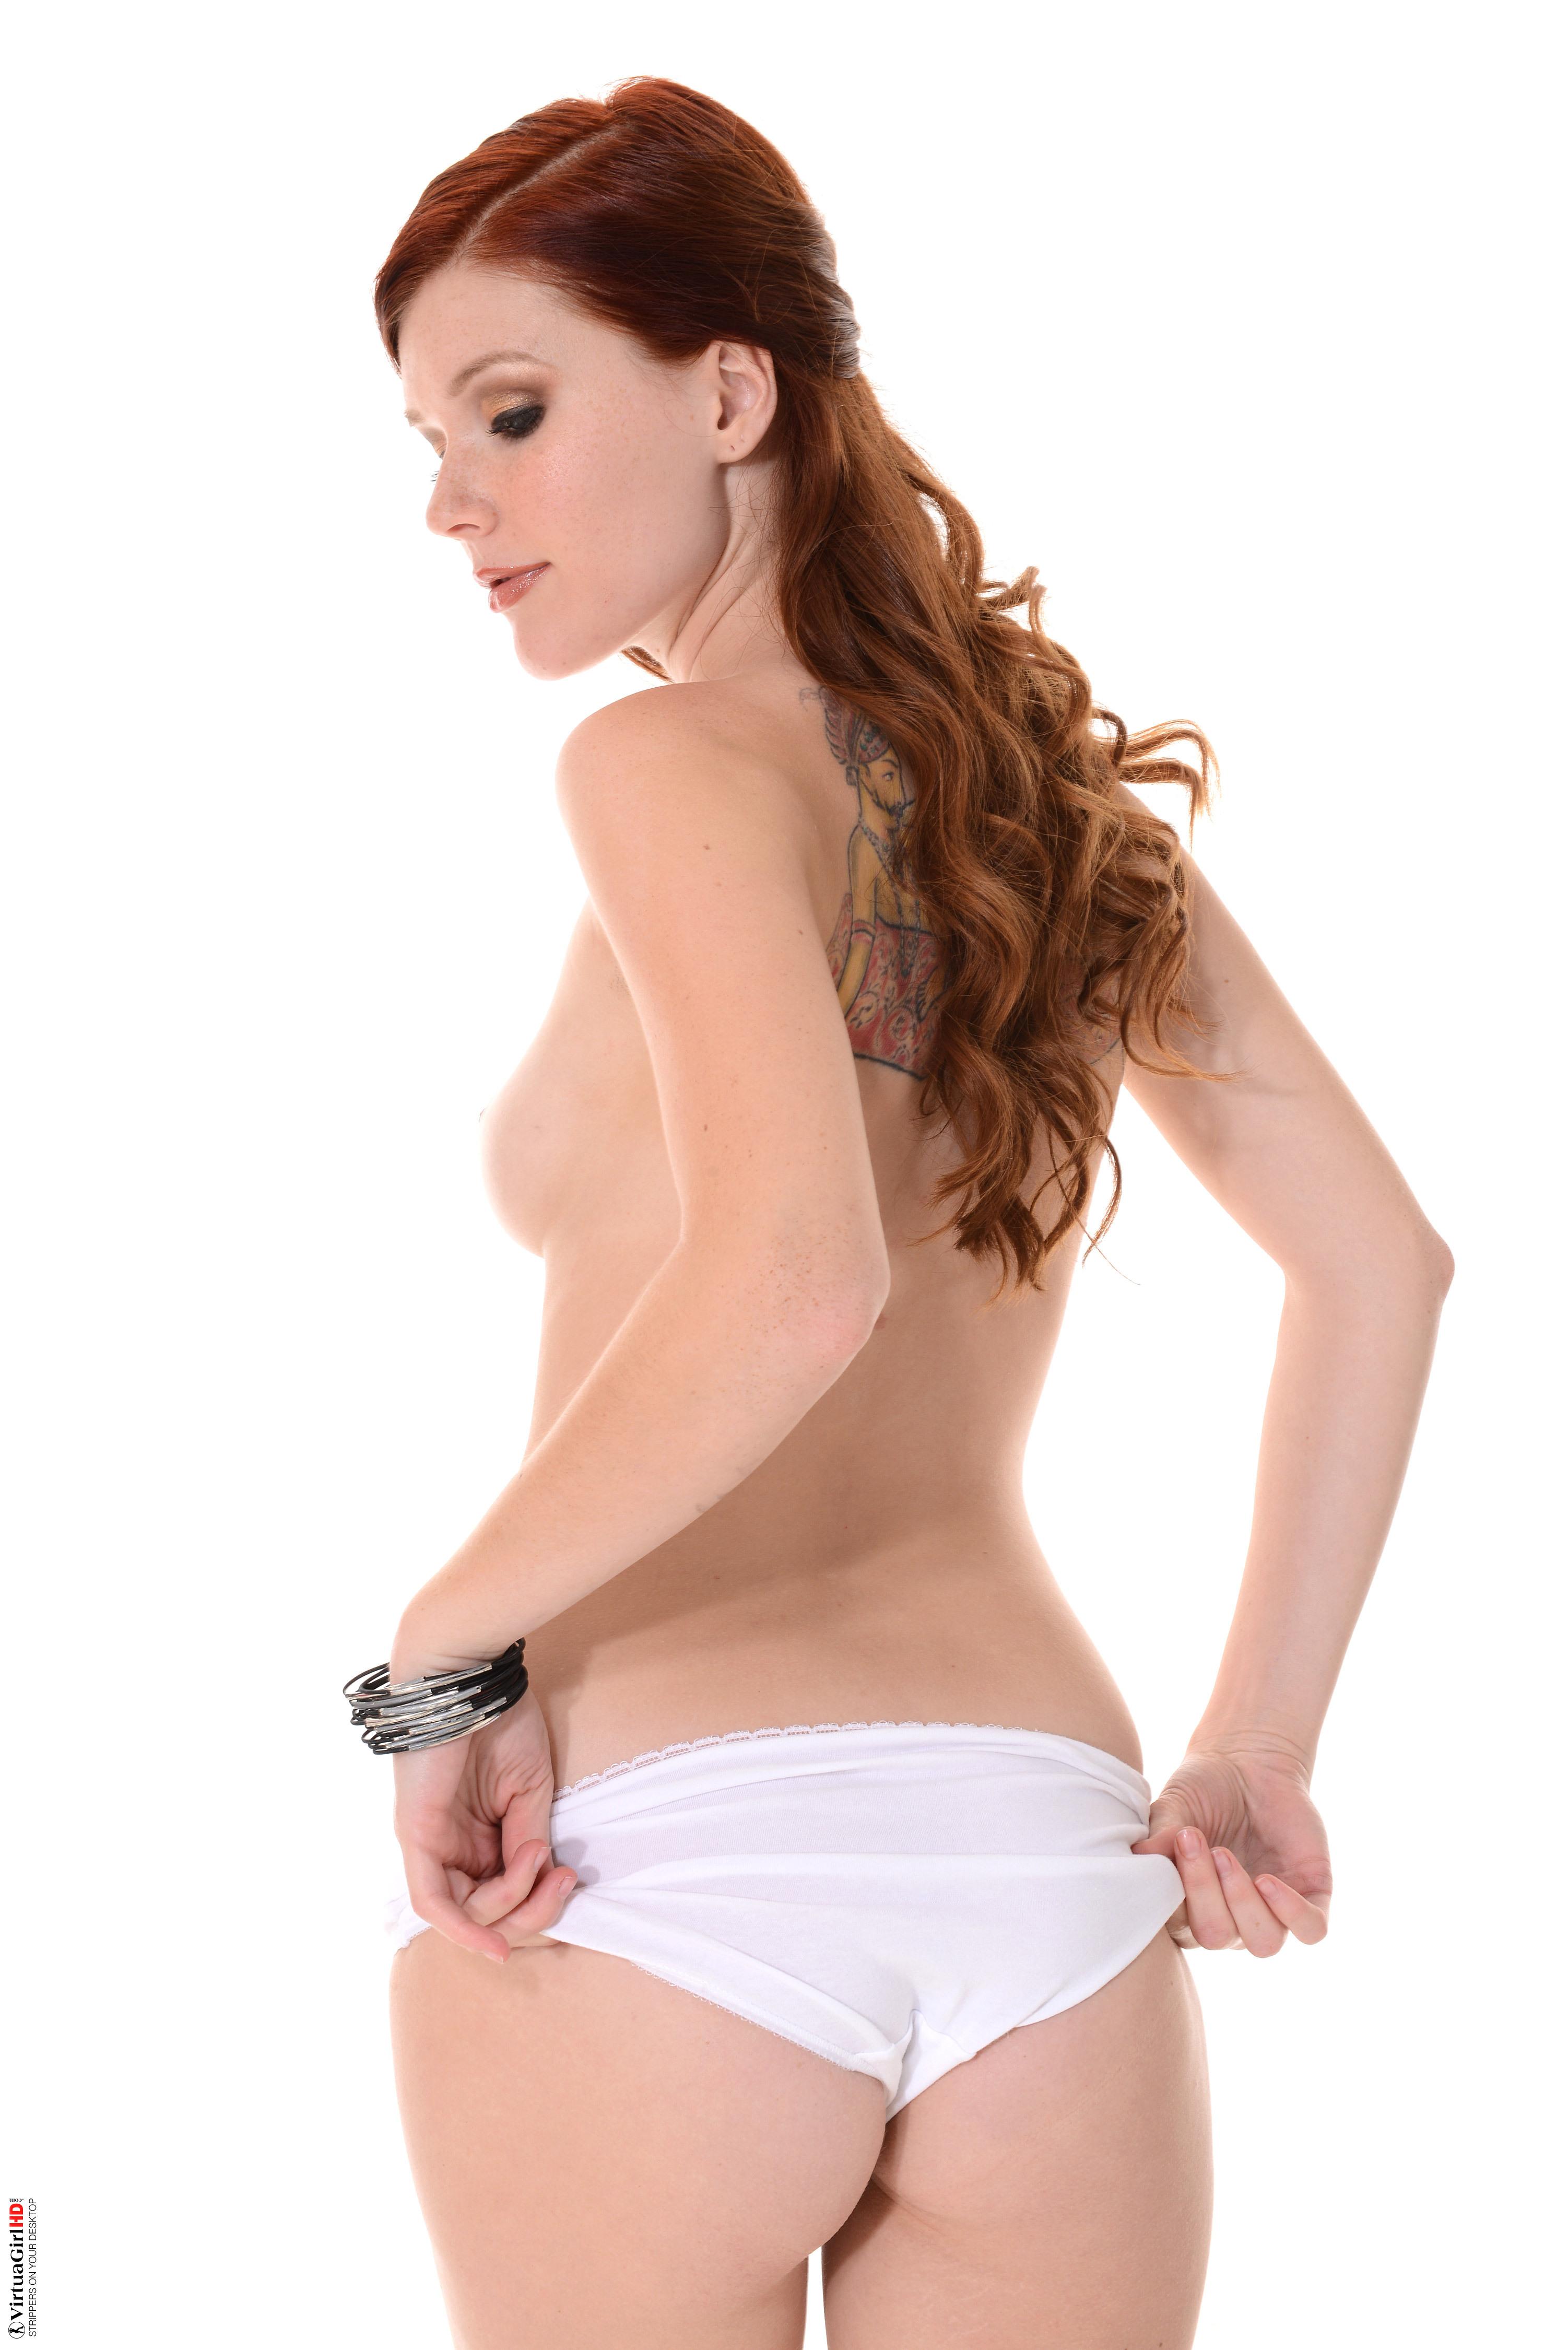 wallpaper of nude women